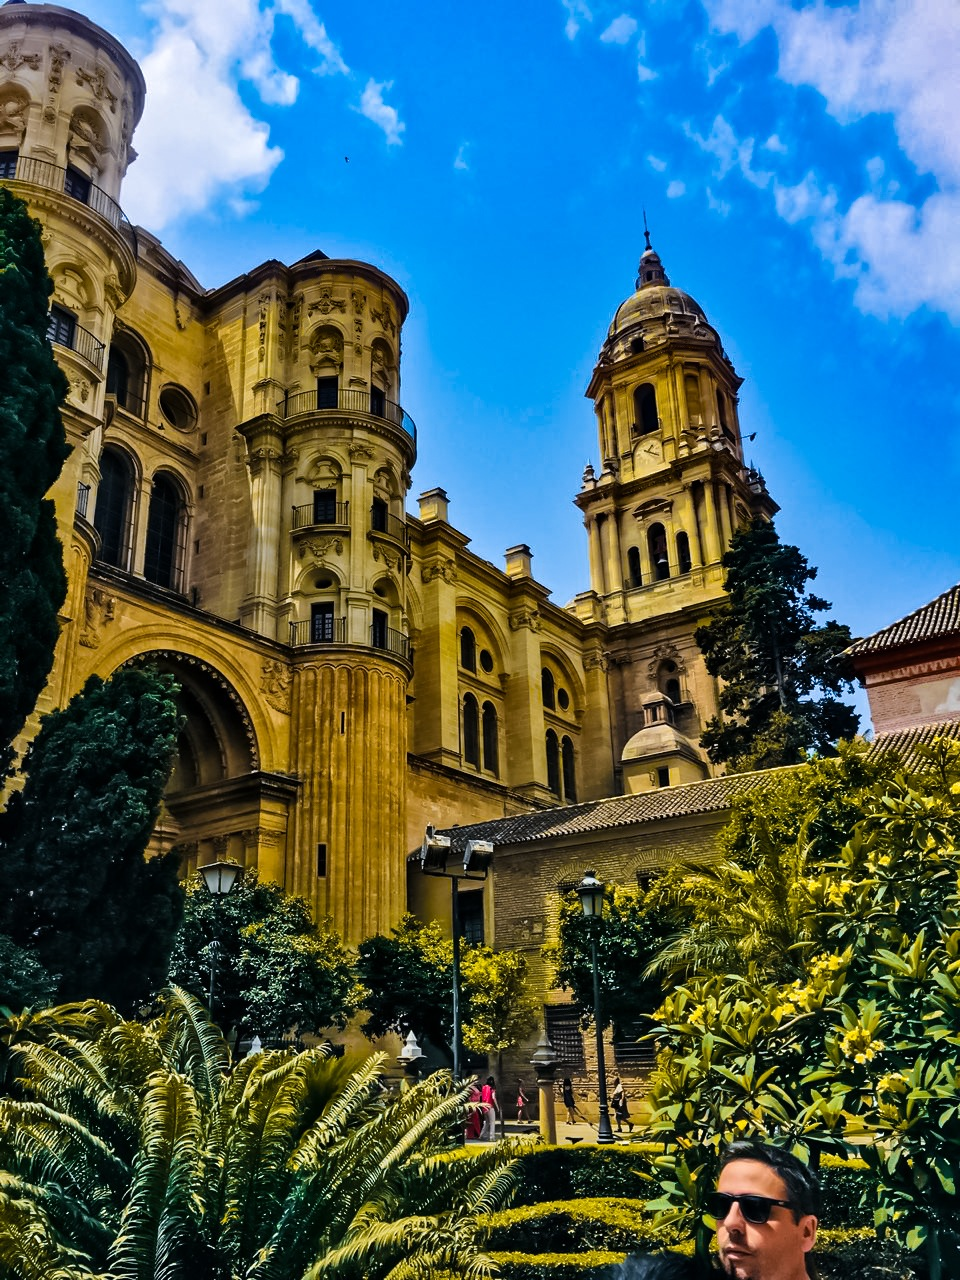 Malaga by Anmol Vishwakarma